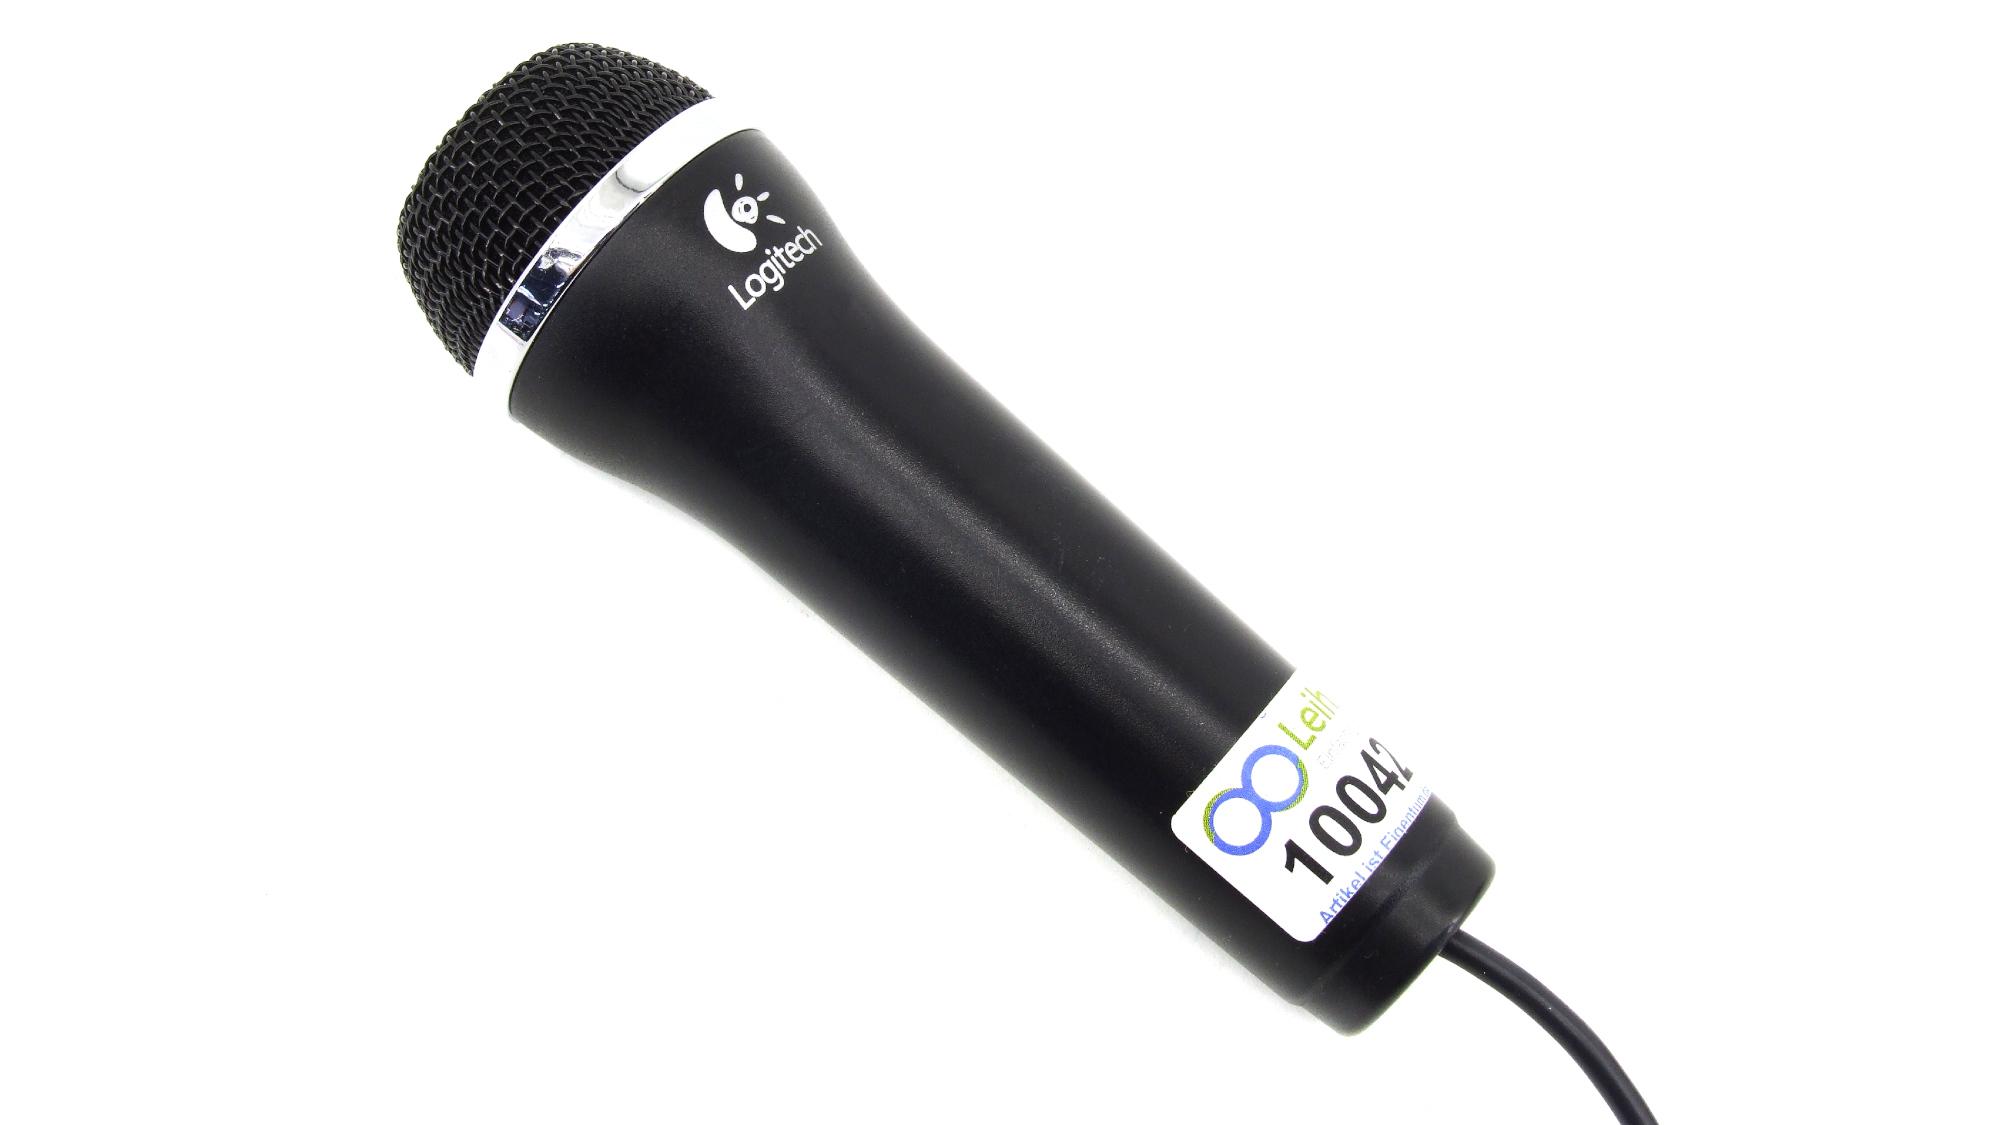 Wii Mikrofon leihen